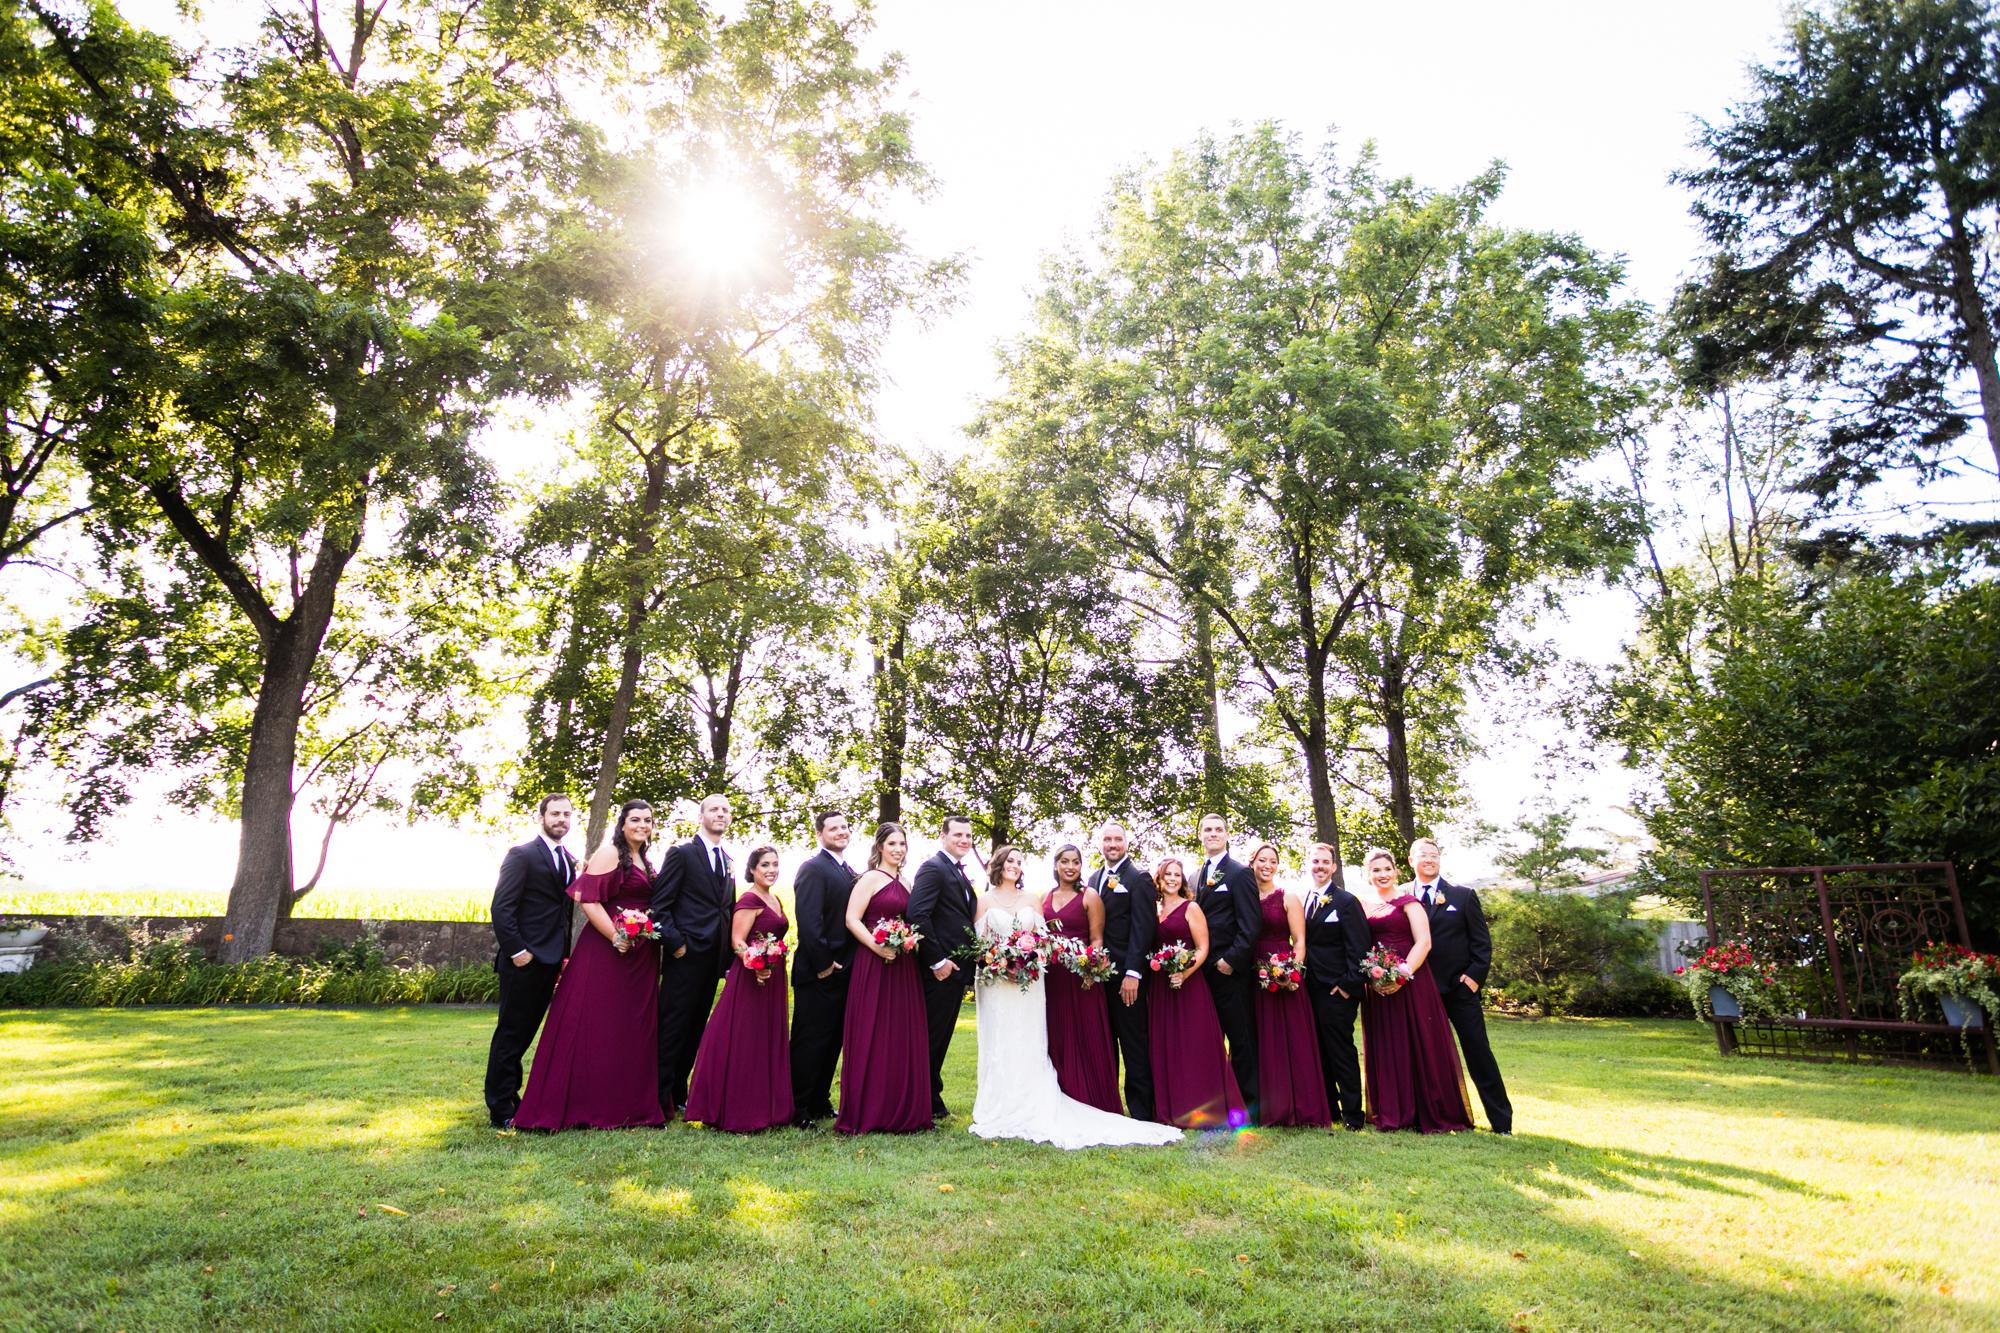 Hotel Du Village - LoveStruck Pictures - Wedding Photography-039.jpg